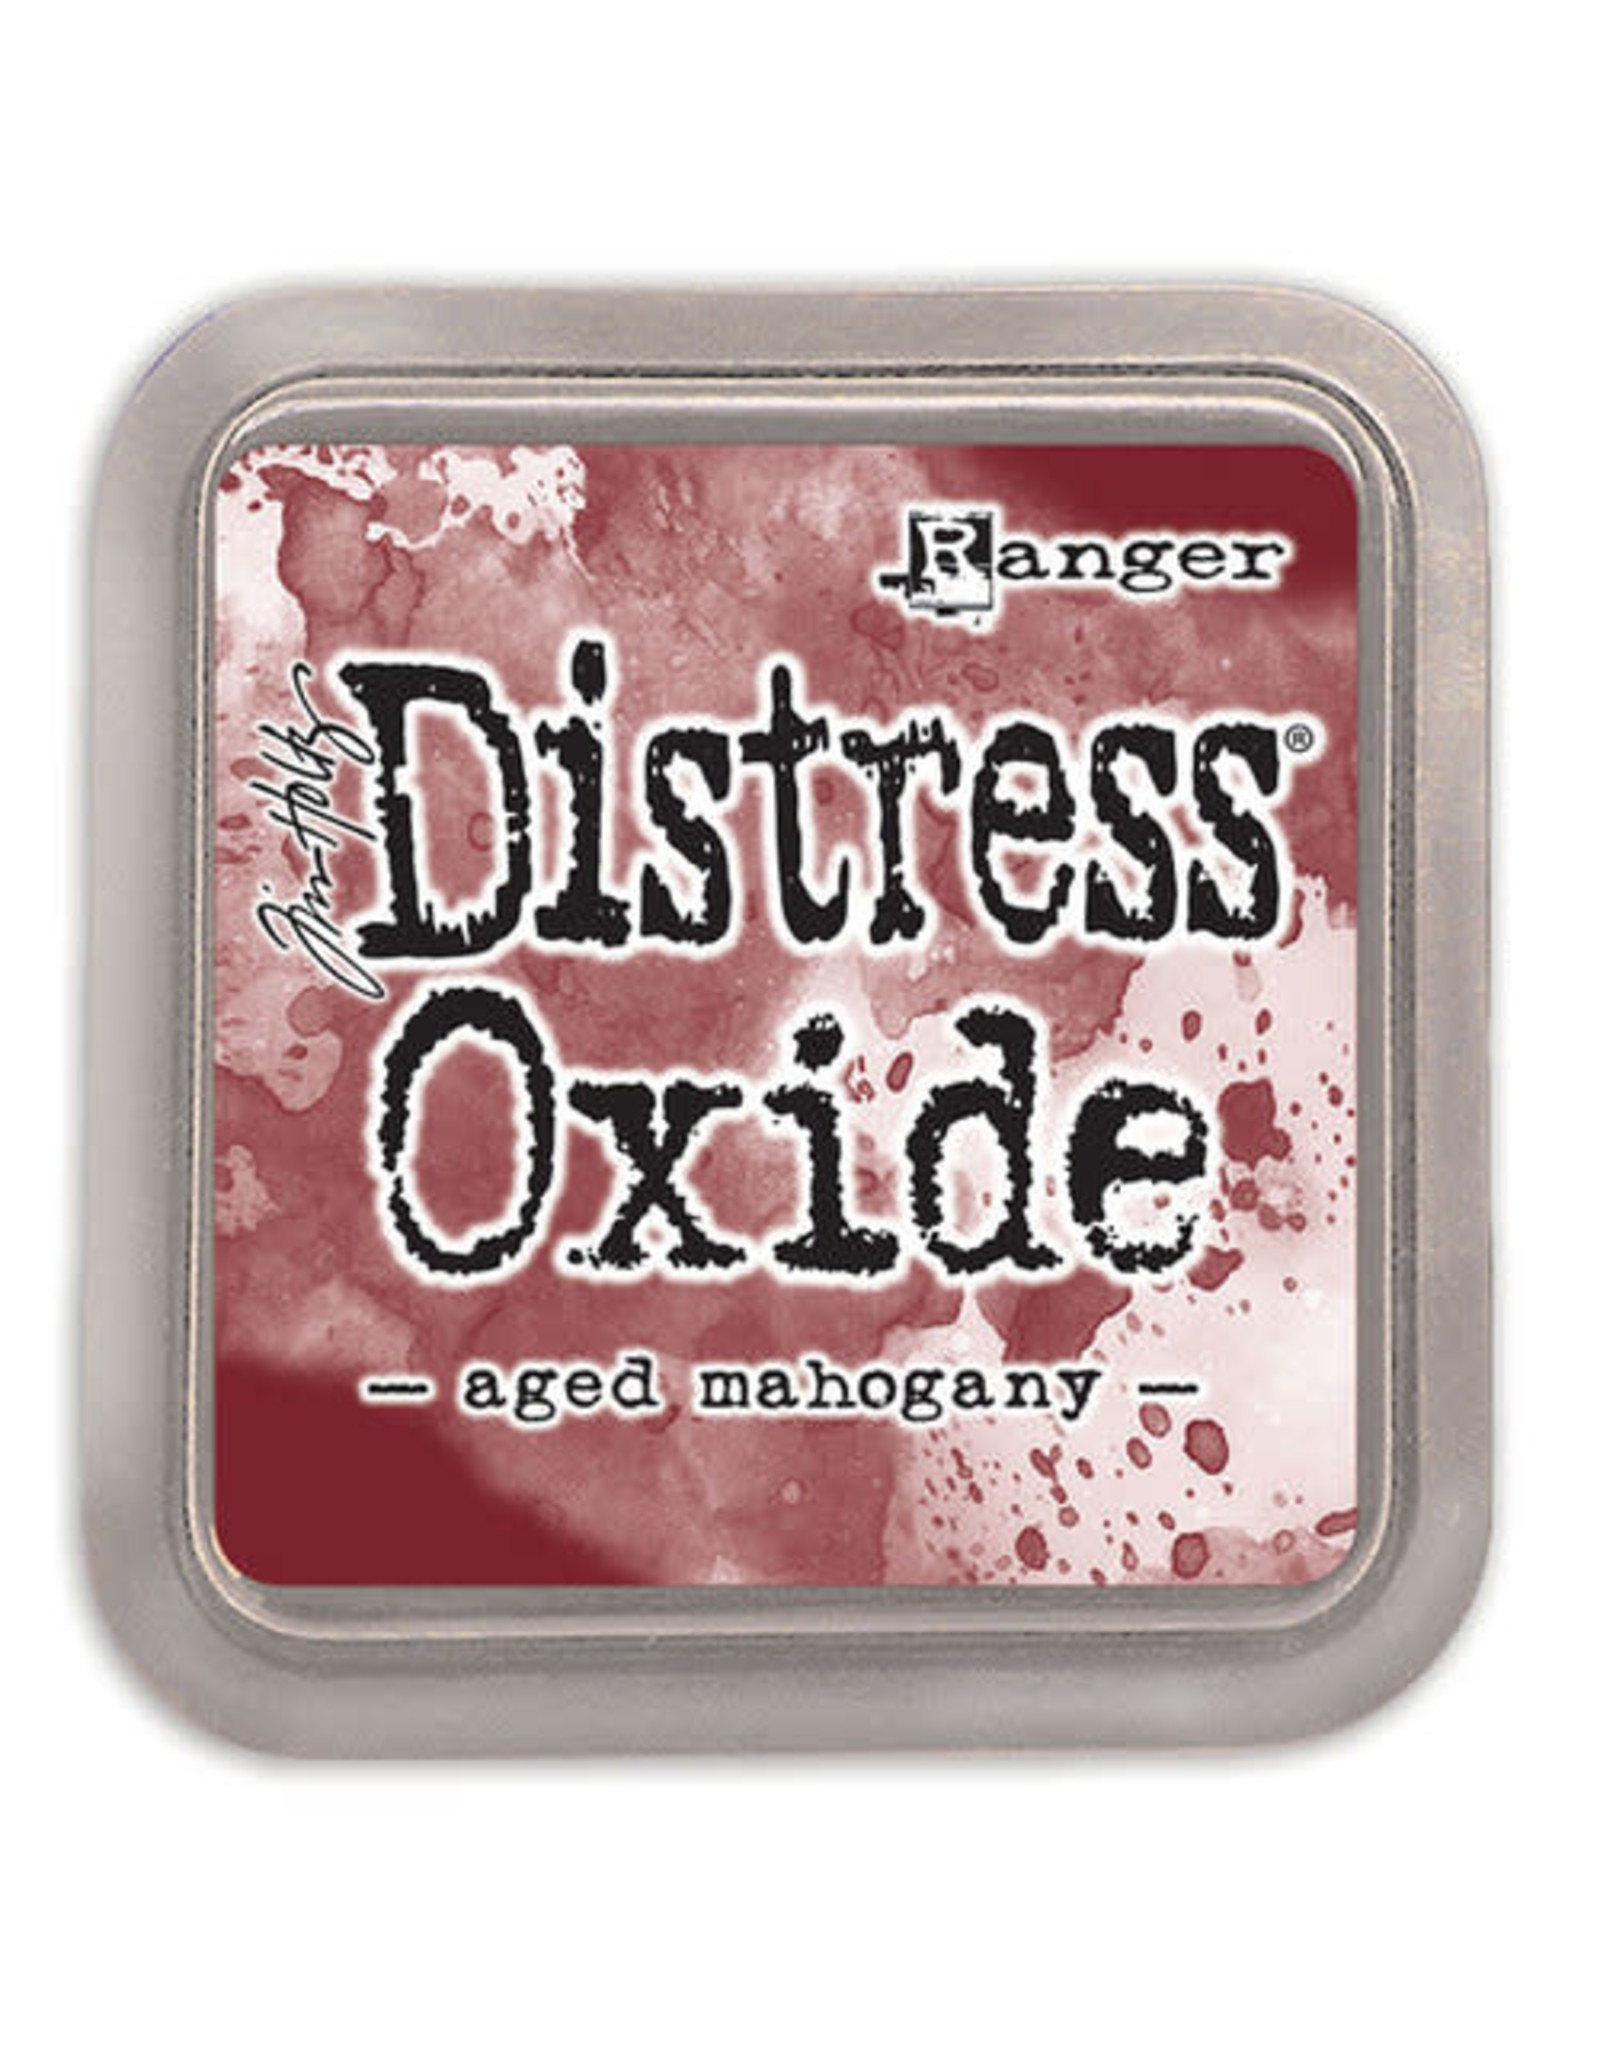 Ranger Distress Oxide - Aged Mahogany